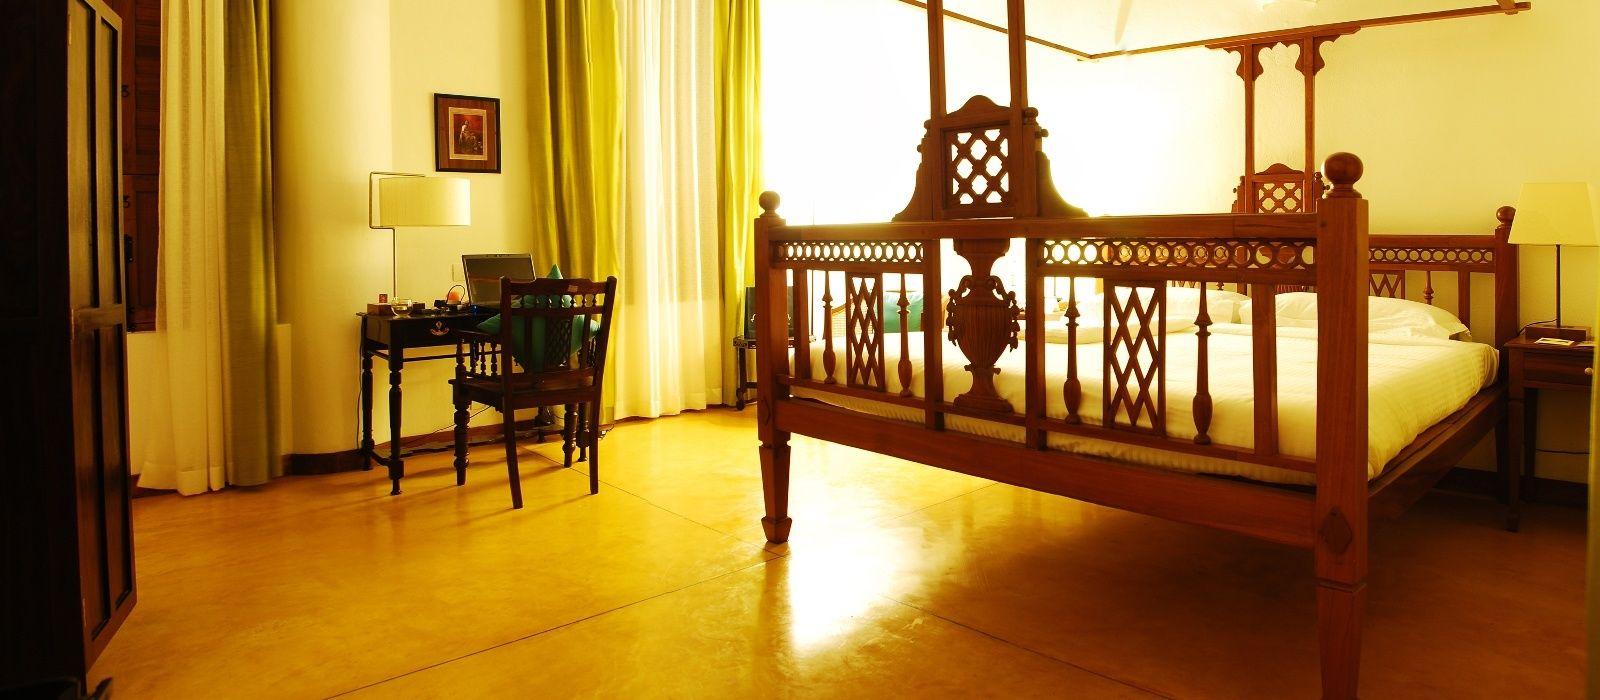 Hotel Maison Perumal South India